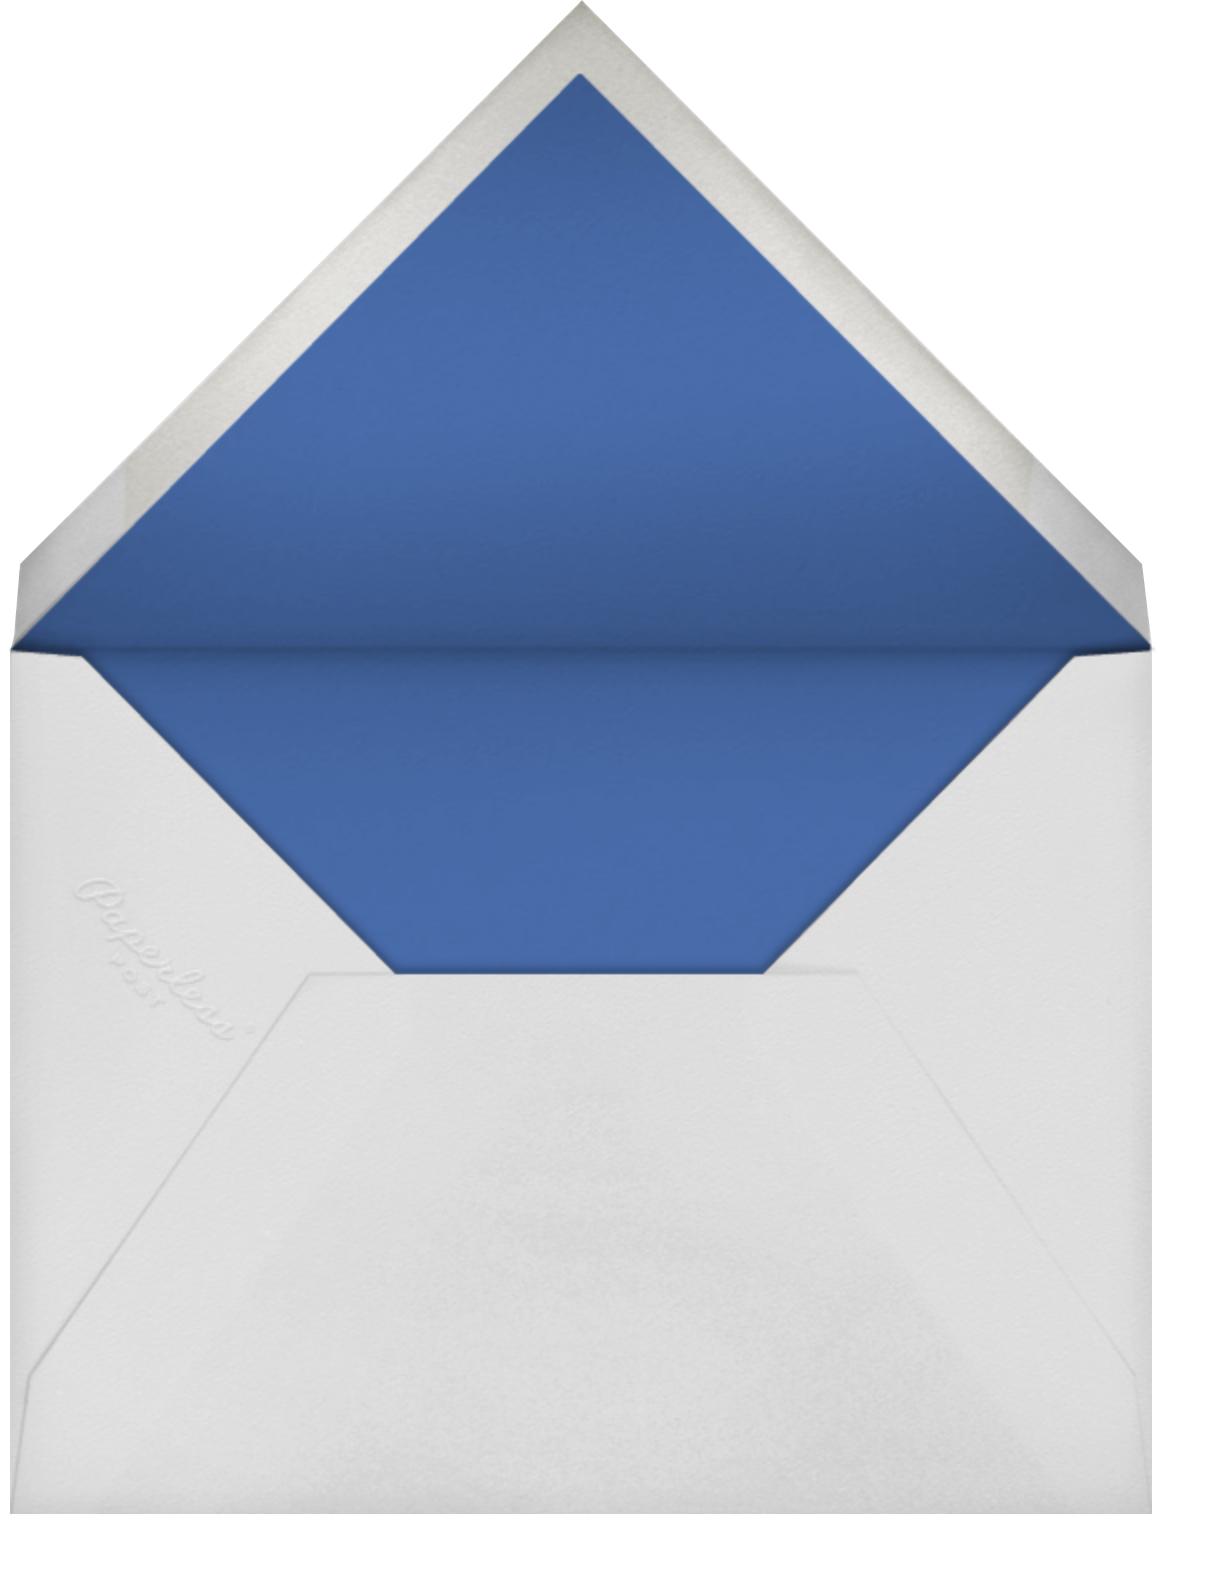 Ottoman Floral - White - Oscar de la Renta - General entertaining - envelope back